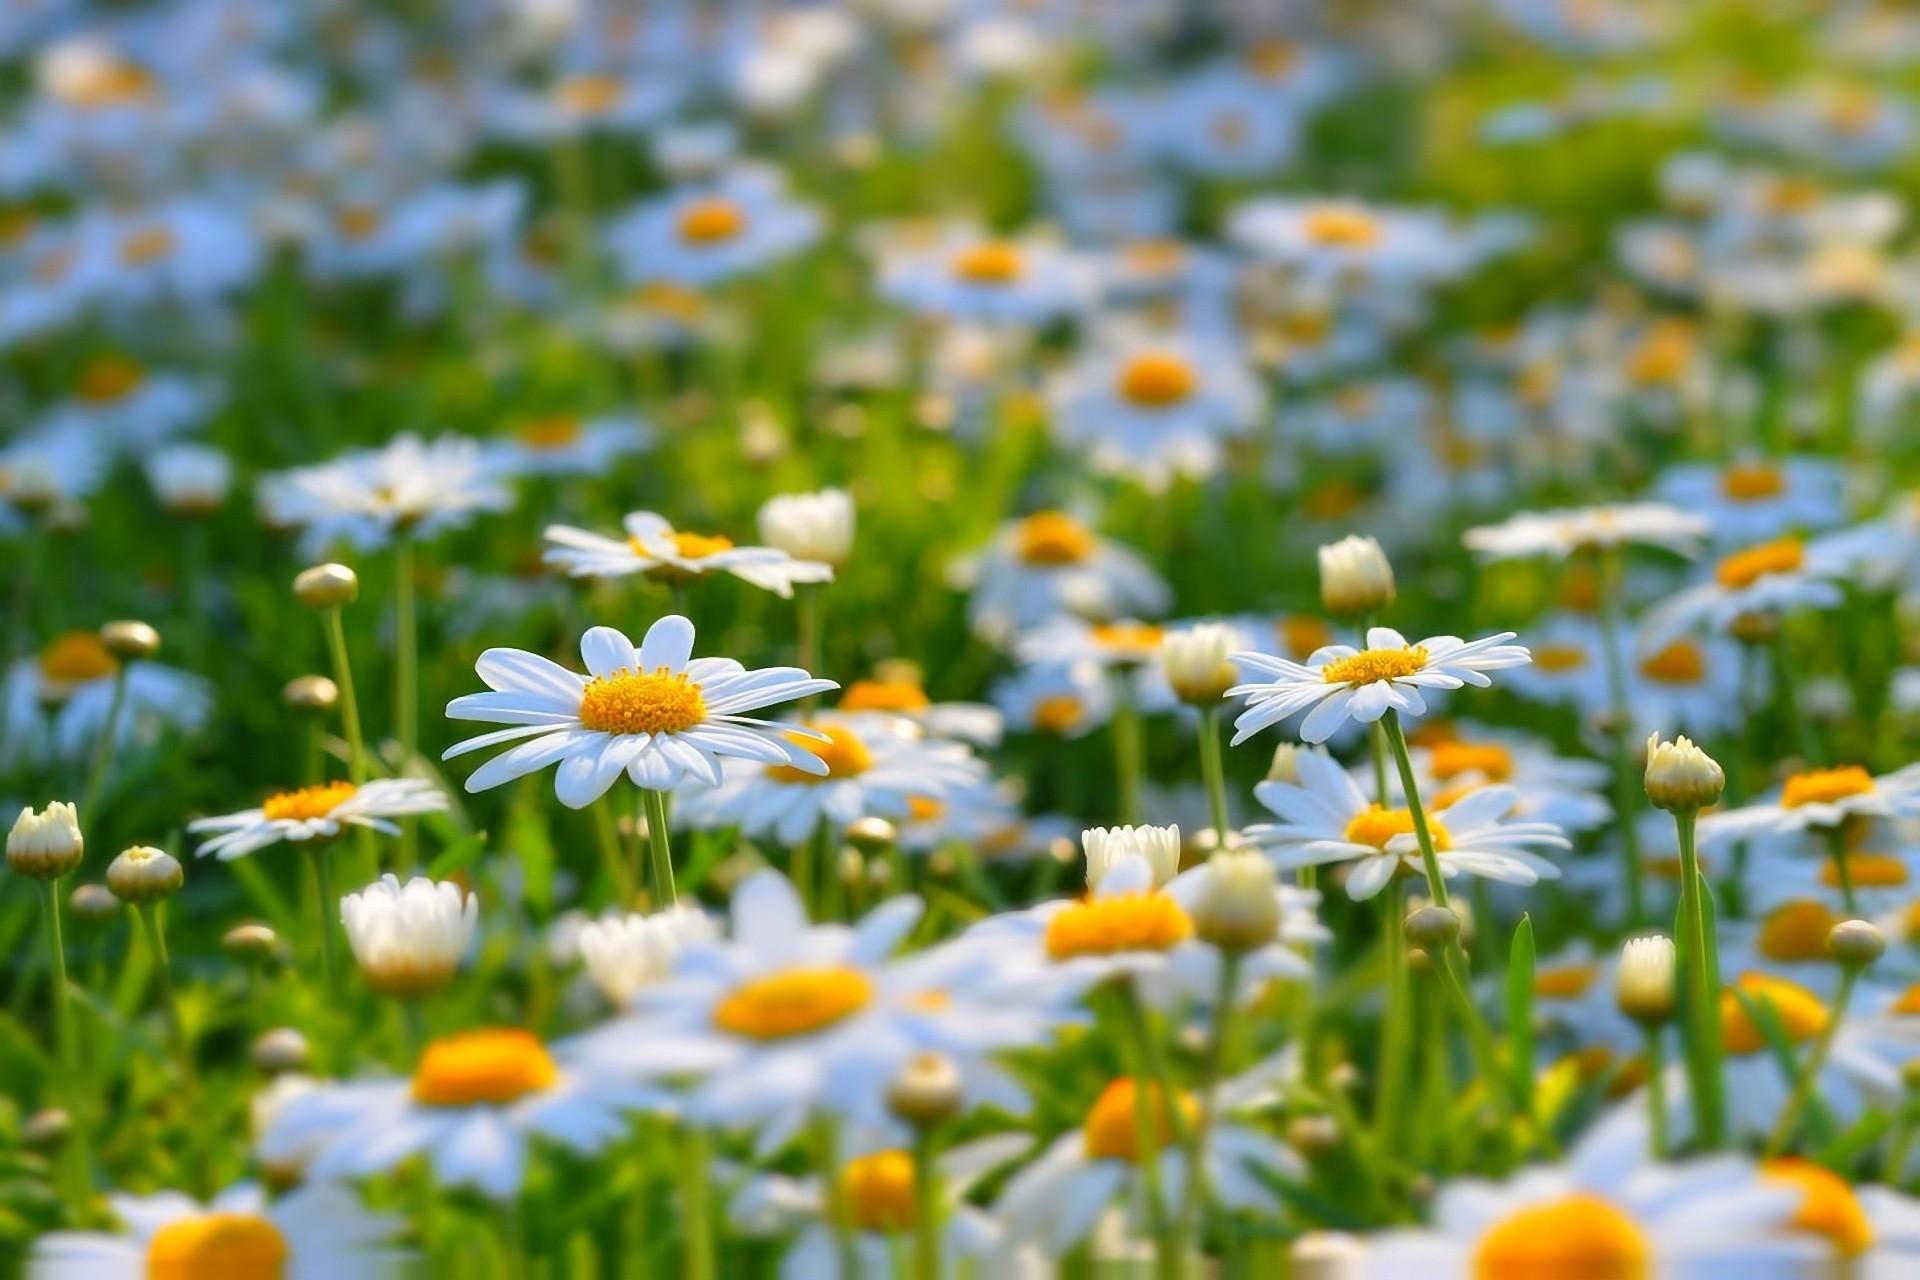 ромашки поле цветы chamomile field flowers без смс